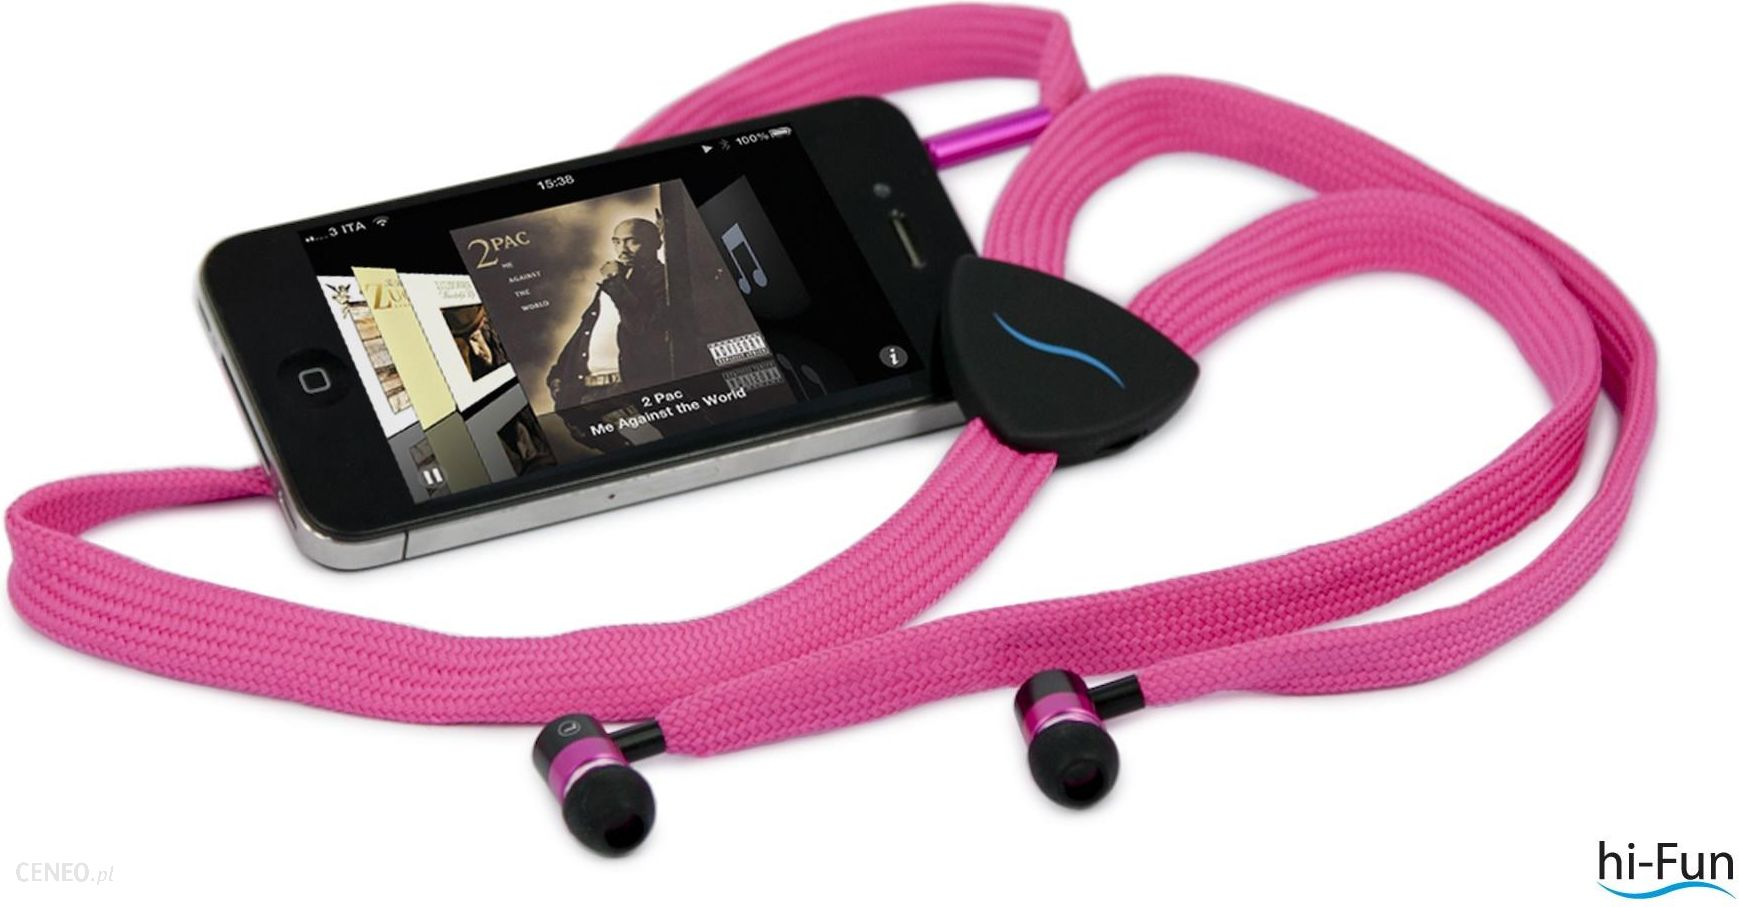 Hi-Fun Słuchawki Hi-String różowe (HFHISTRING-PNK)